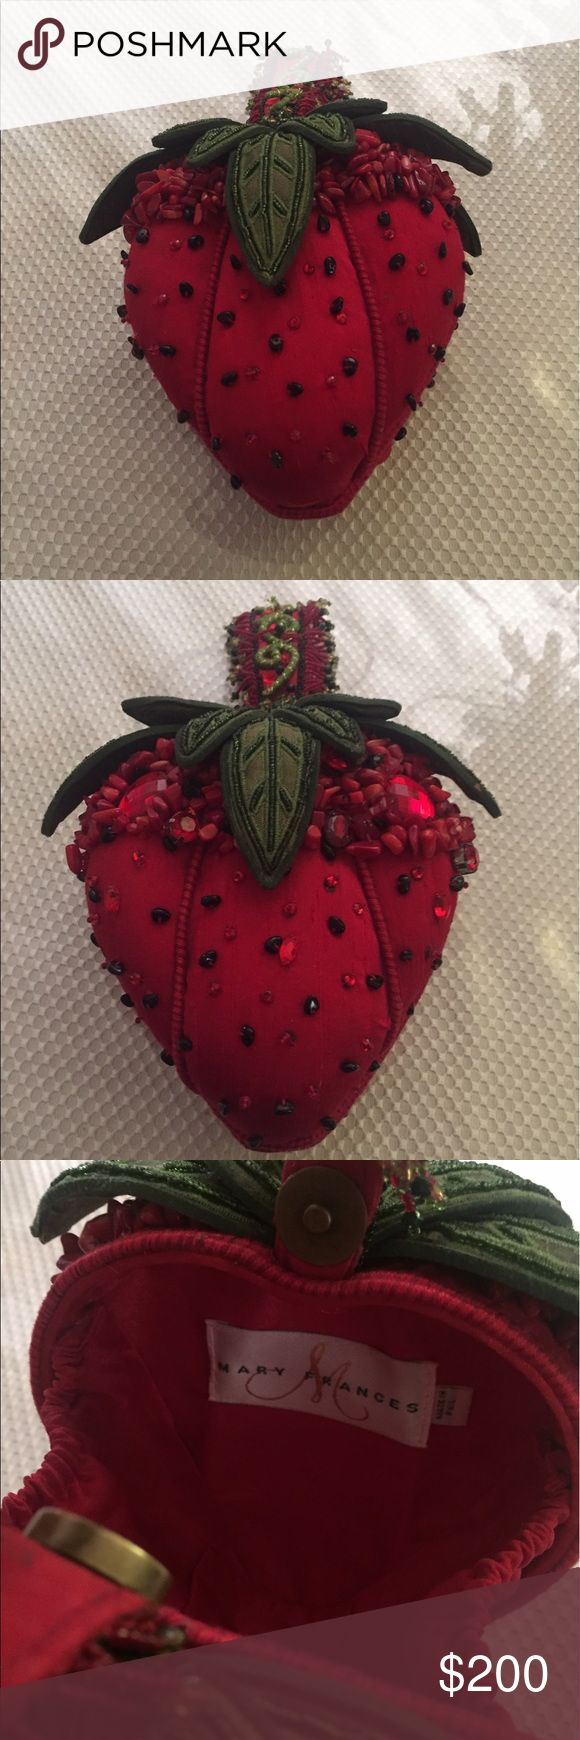 Mary Frances handbag Designer Vintage Mary Frances strawberry handbag in perfect condition Mary Frances Bags